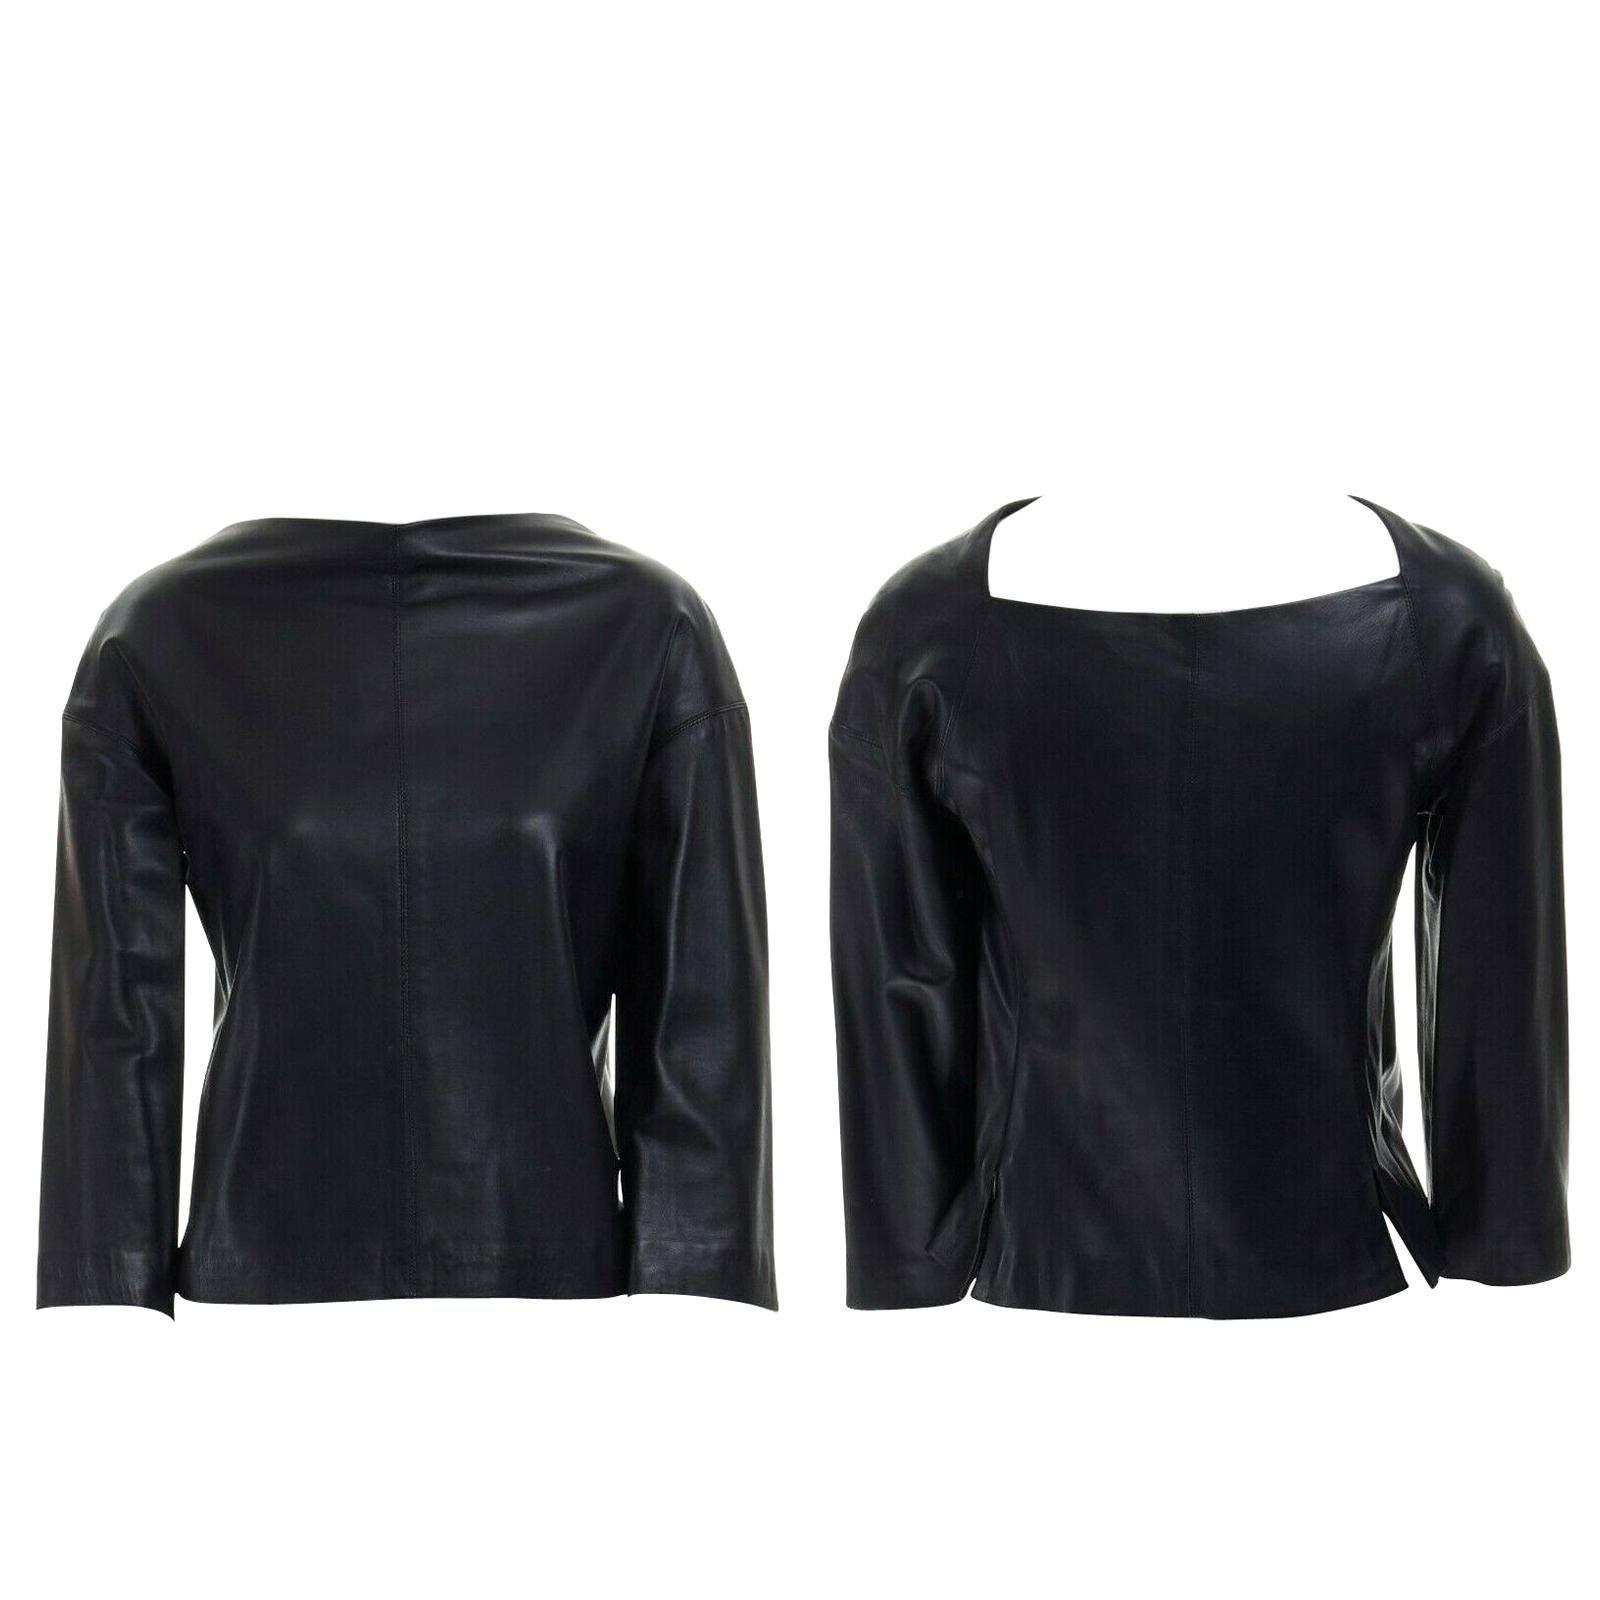 DONNA KARAN 100% lambskin leather wide angular neckline 3/4 sleeves top US4 S